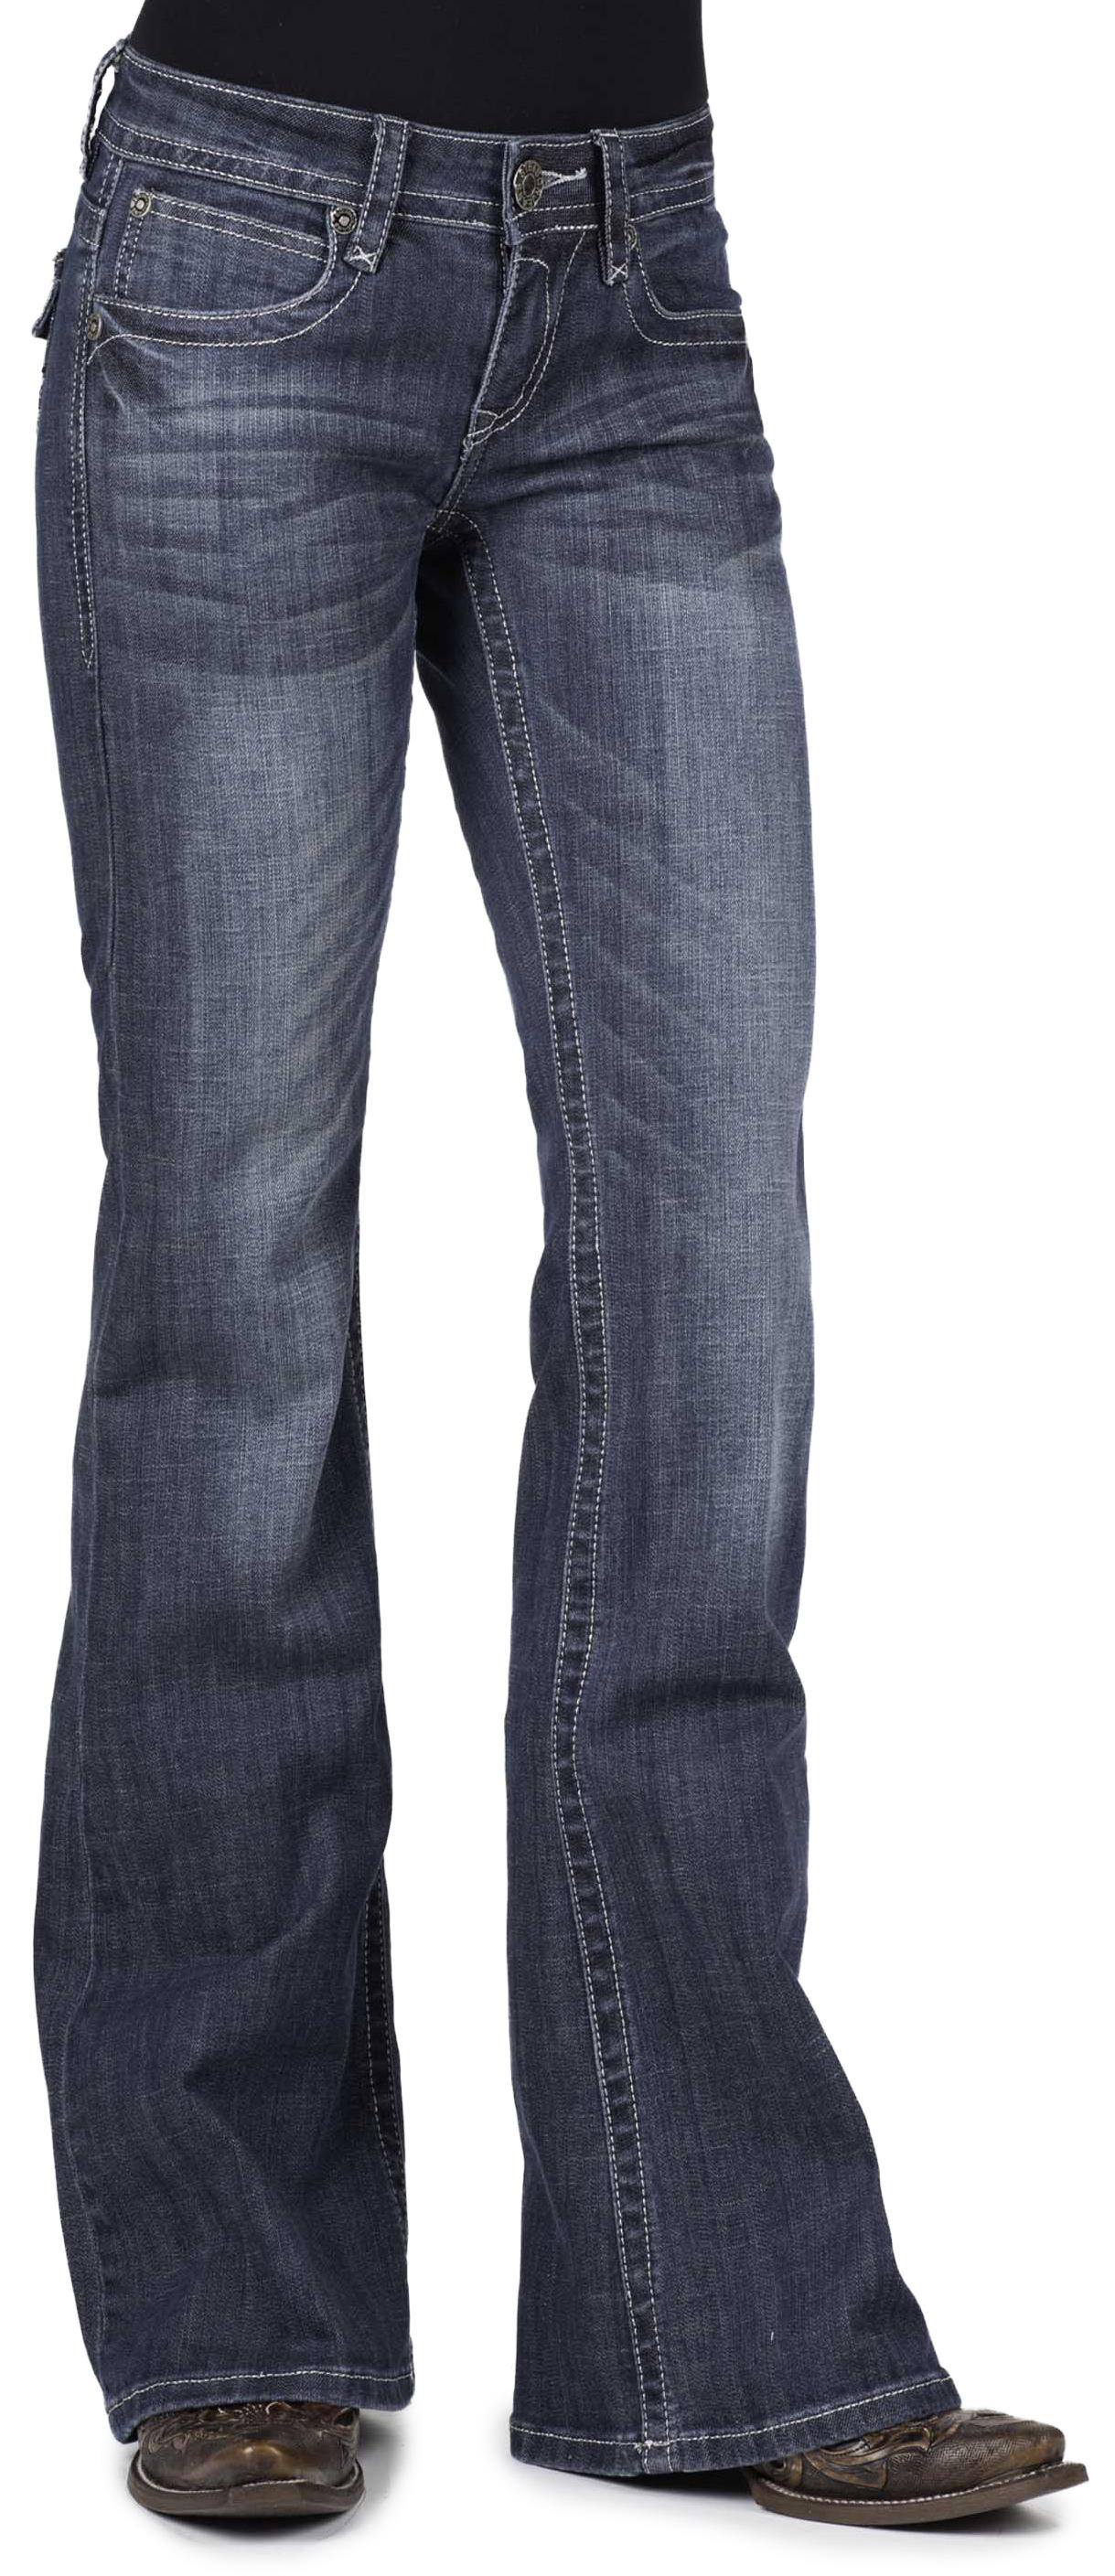 bootcut jeans herren ltb herren jeans tinman bootcut 2. Black Bedroom Furniture Sets. Home Design Ideas